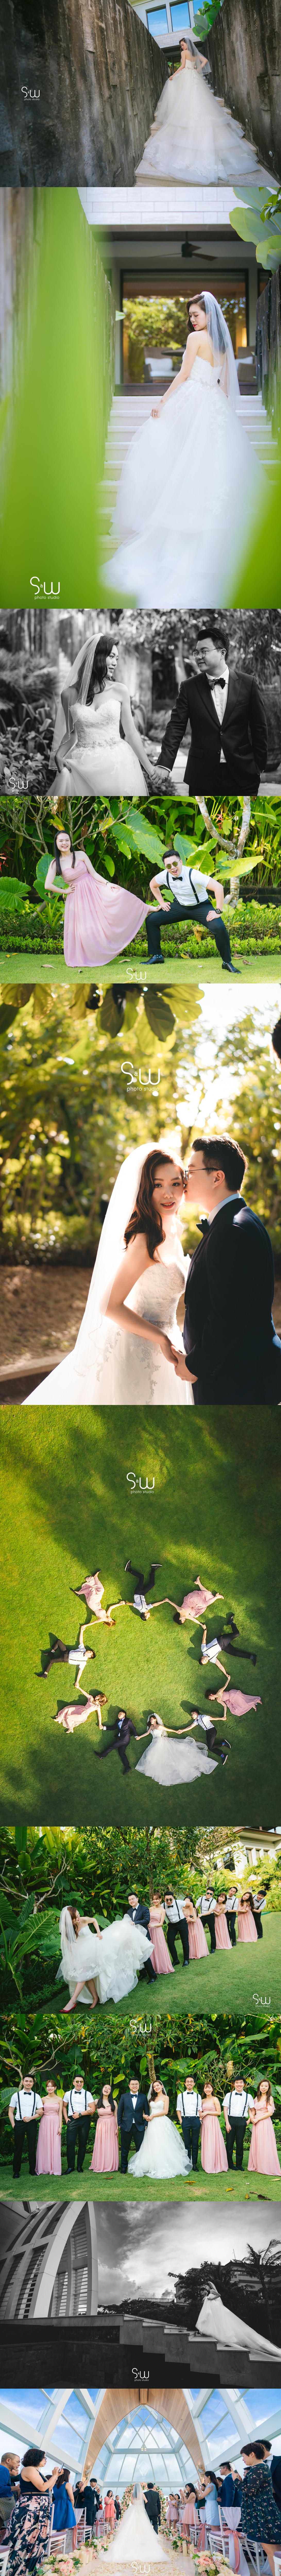 WEDDING | The Ritz-Carlton, Bali(峇里島婚禮) | sw photo studio 婚禮, 婚攝, 婚紗, 海外婚禮, 海外婚紗, 海島婚禮,峇里島婚禮, 峇里島婚紗, 台灣婚禮, 婚攝推薦